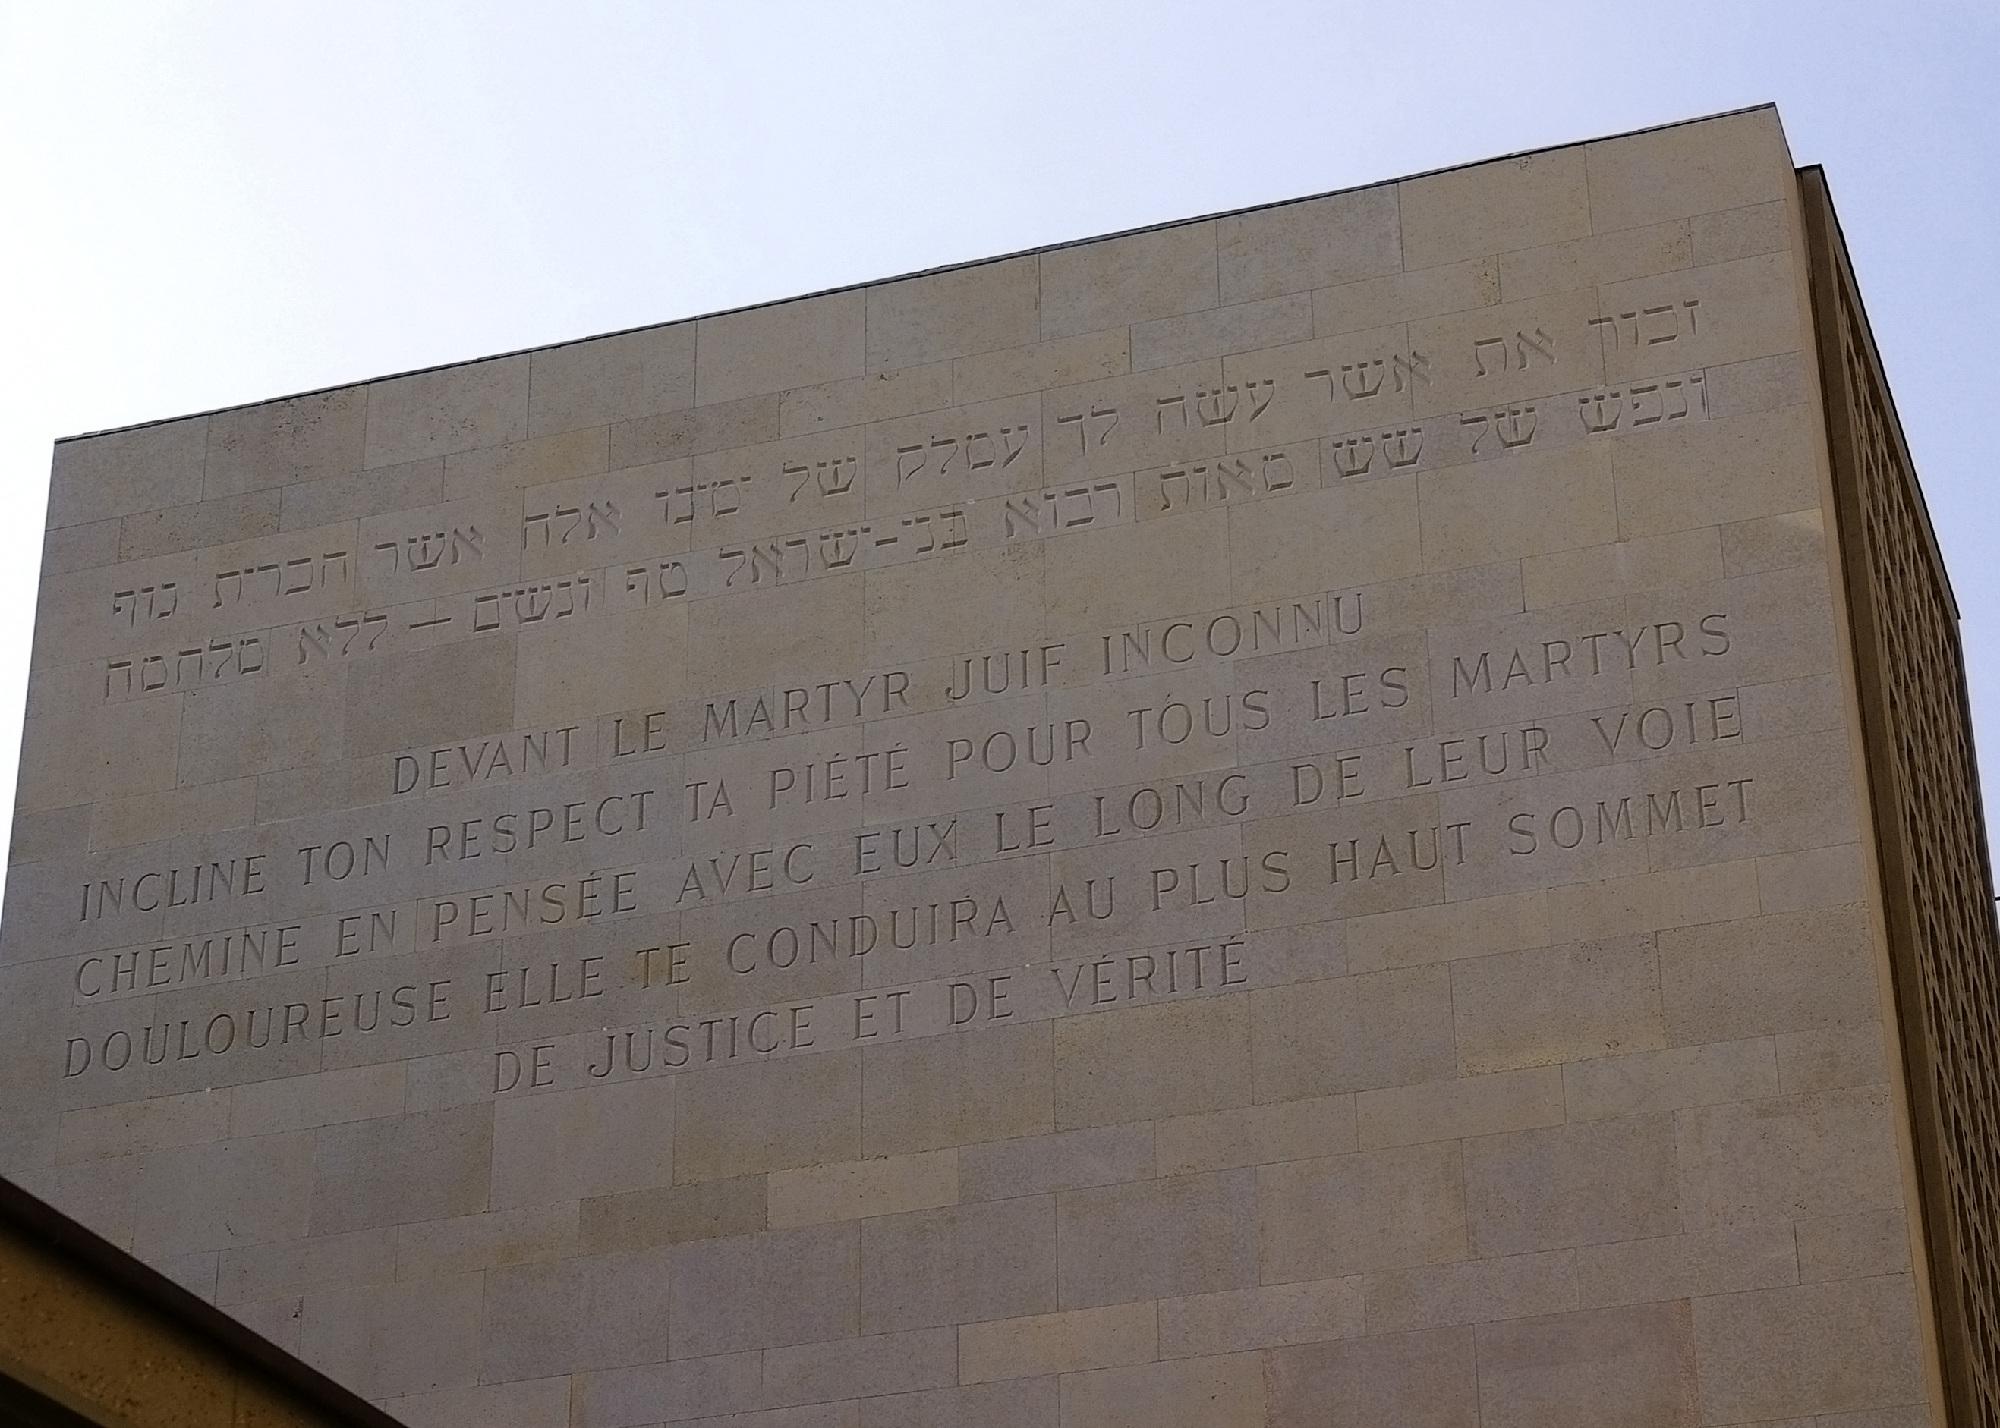 Mémorial de la Shoah 75004 Paris